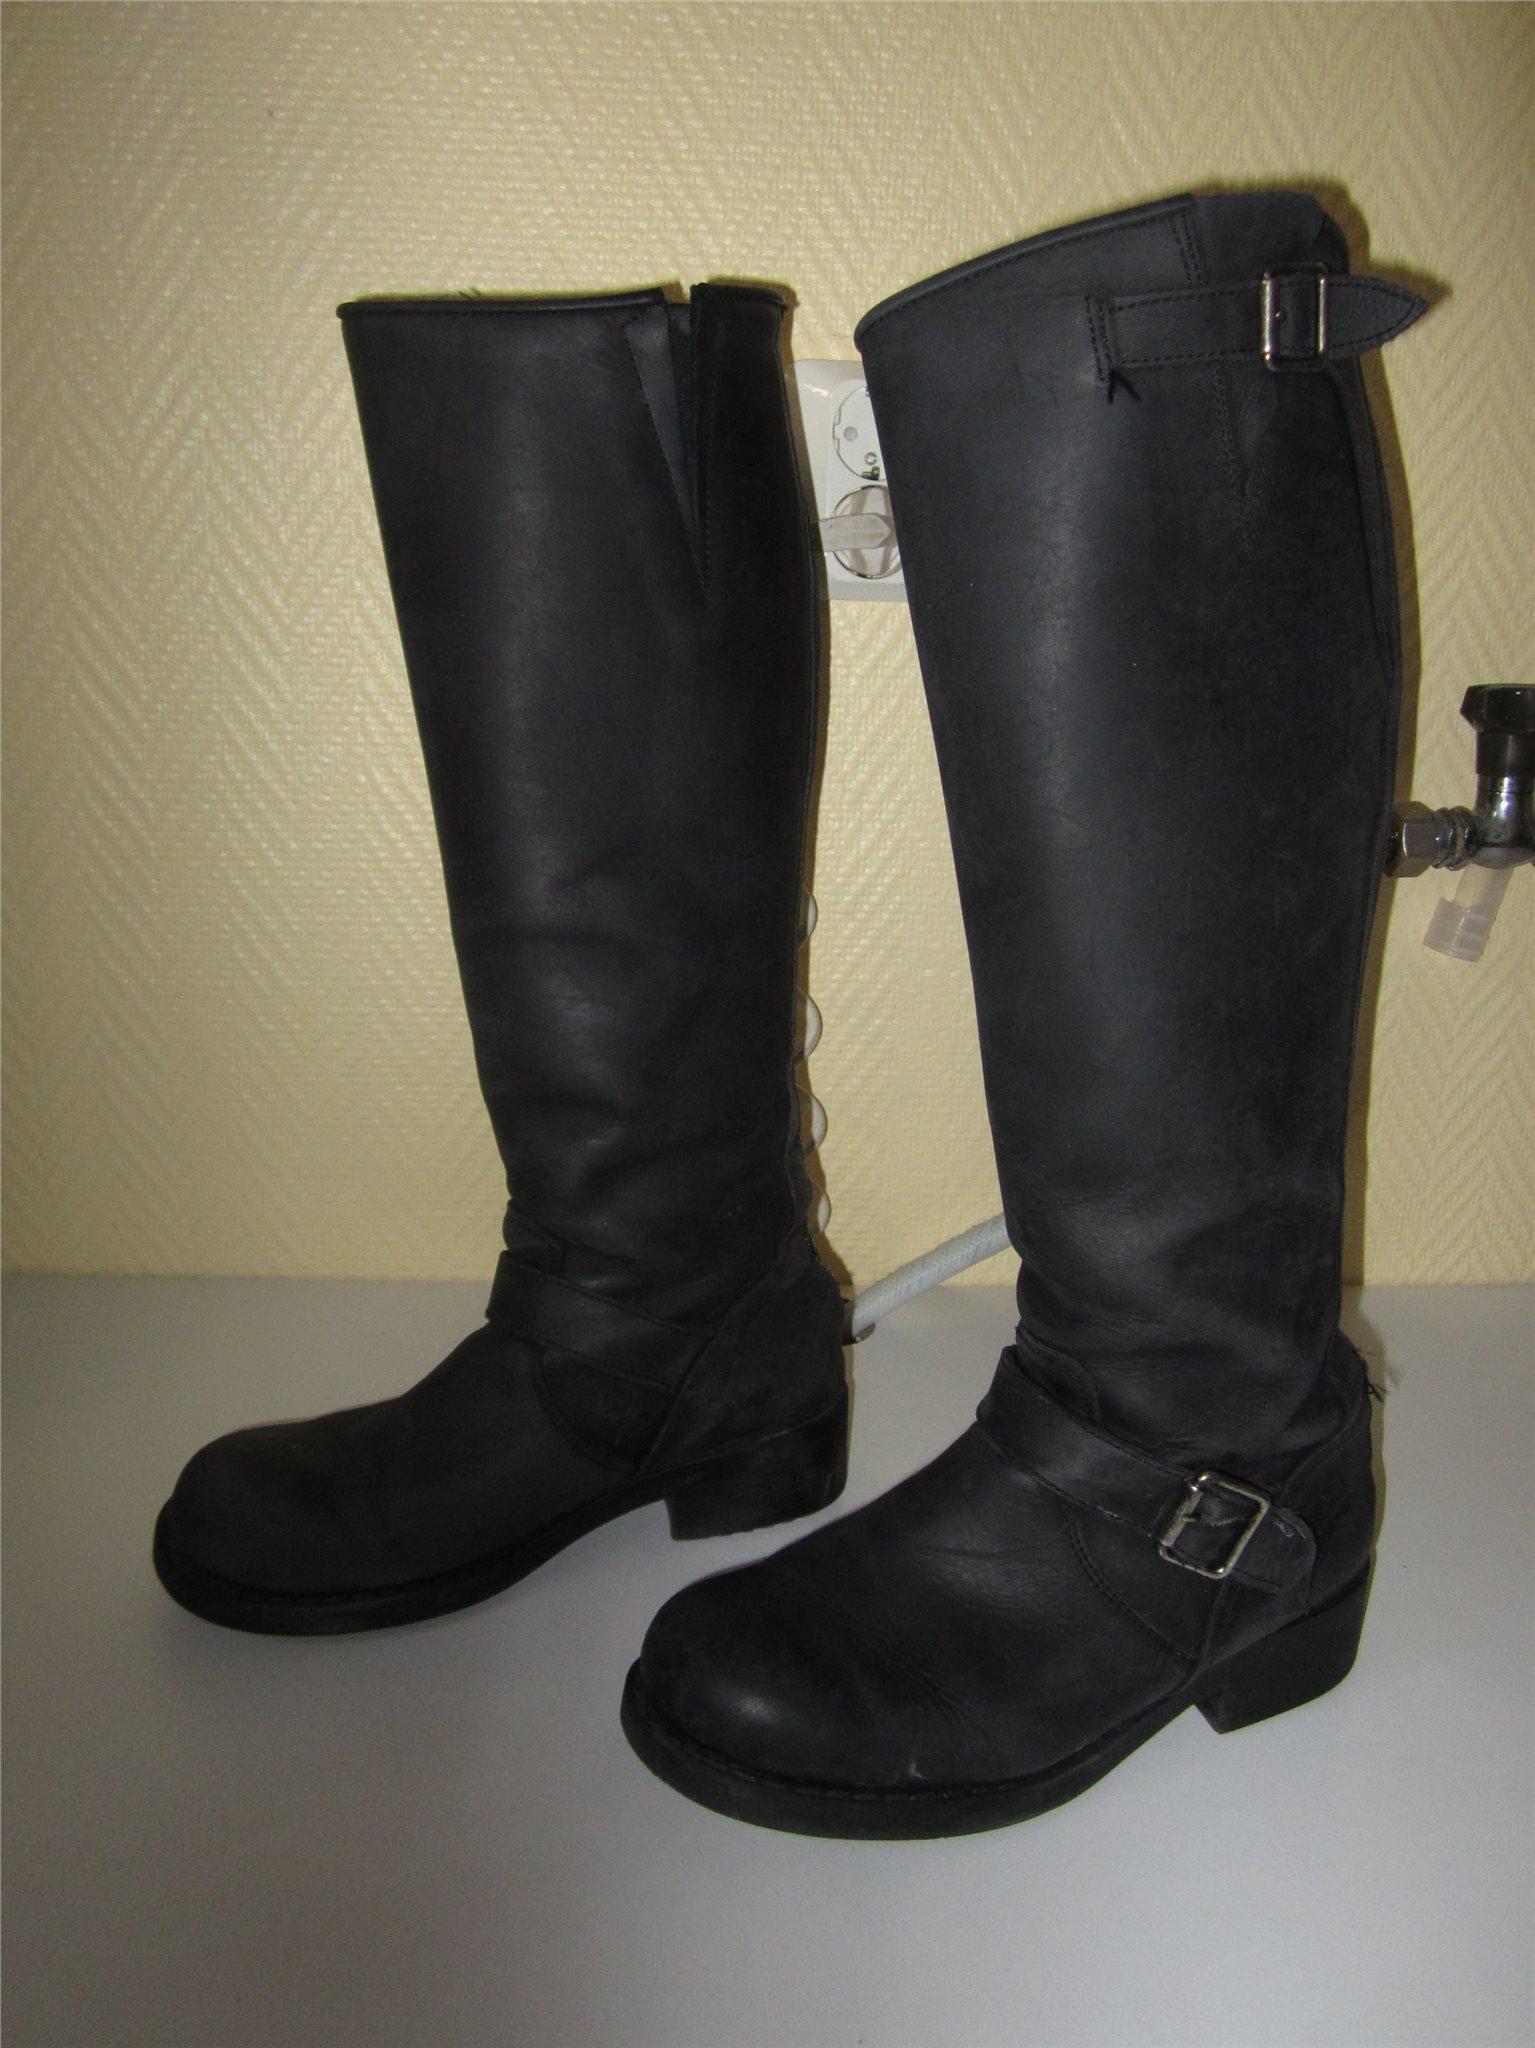 boots dragkedja bak